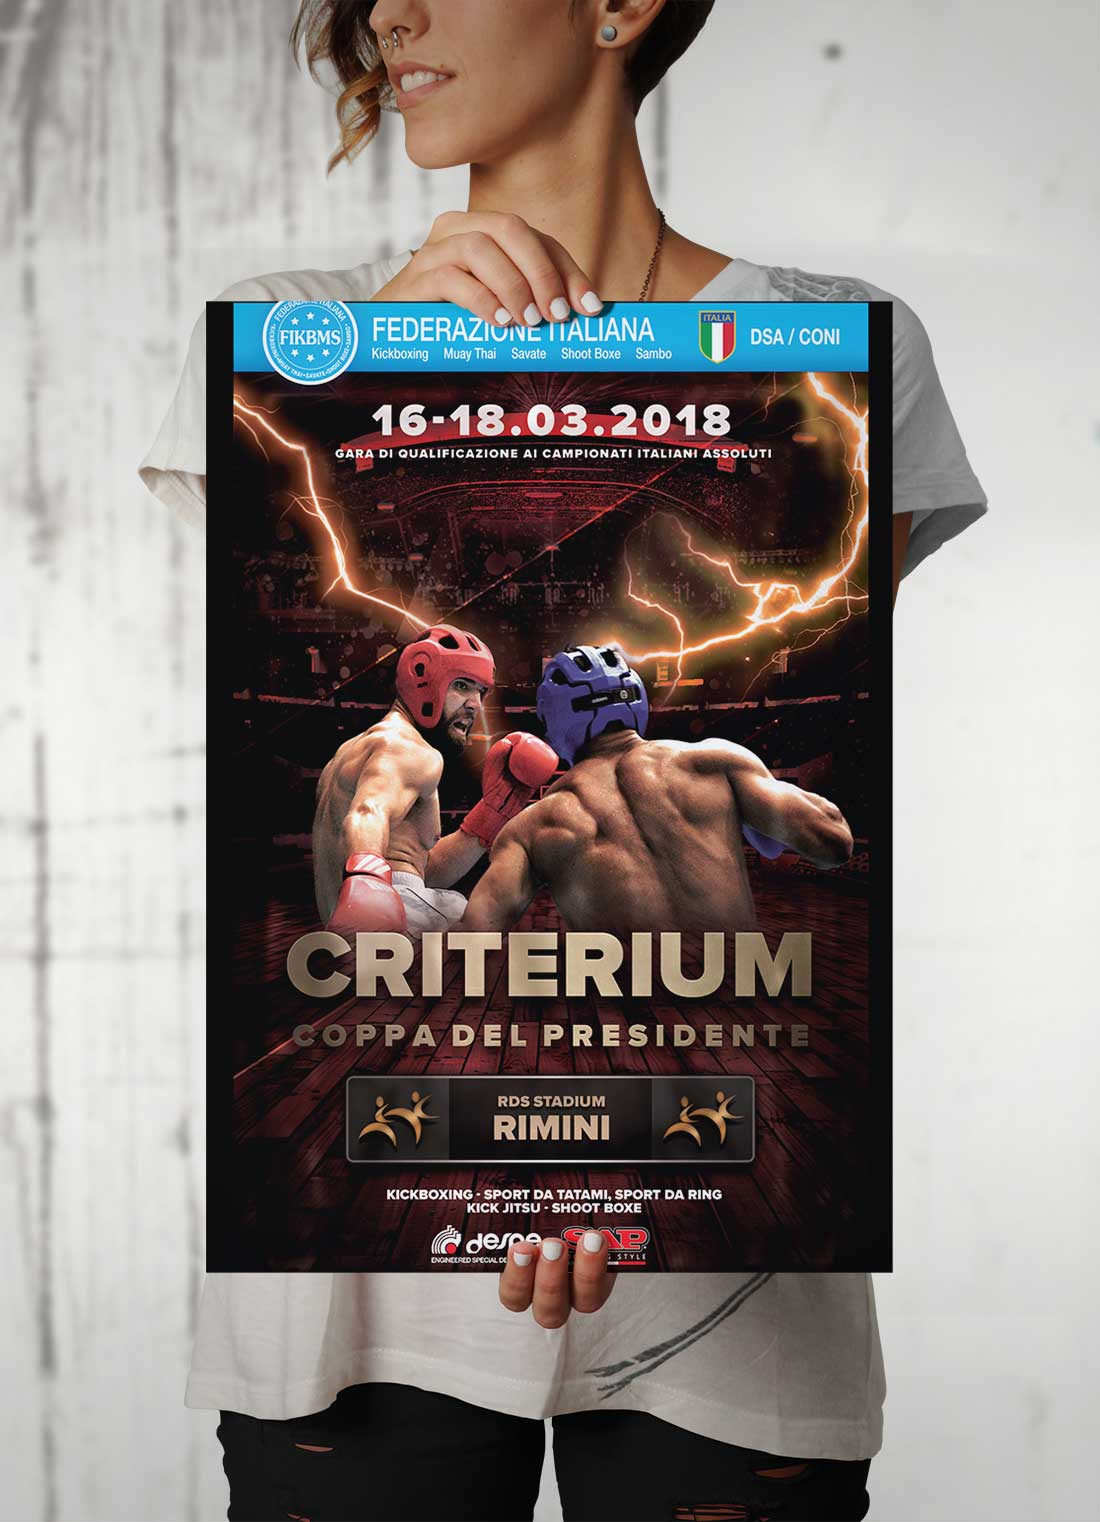 CriteriumASD La Dama Kombat, palestra savate, kick boxing, k1, Genova